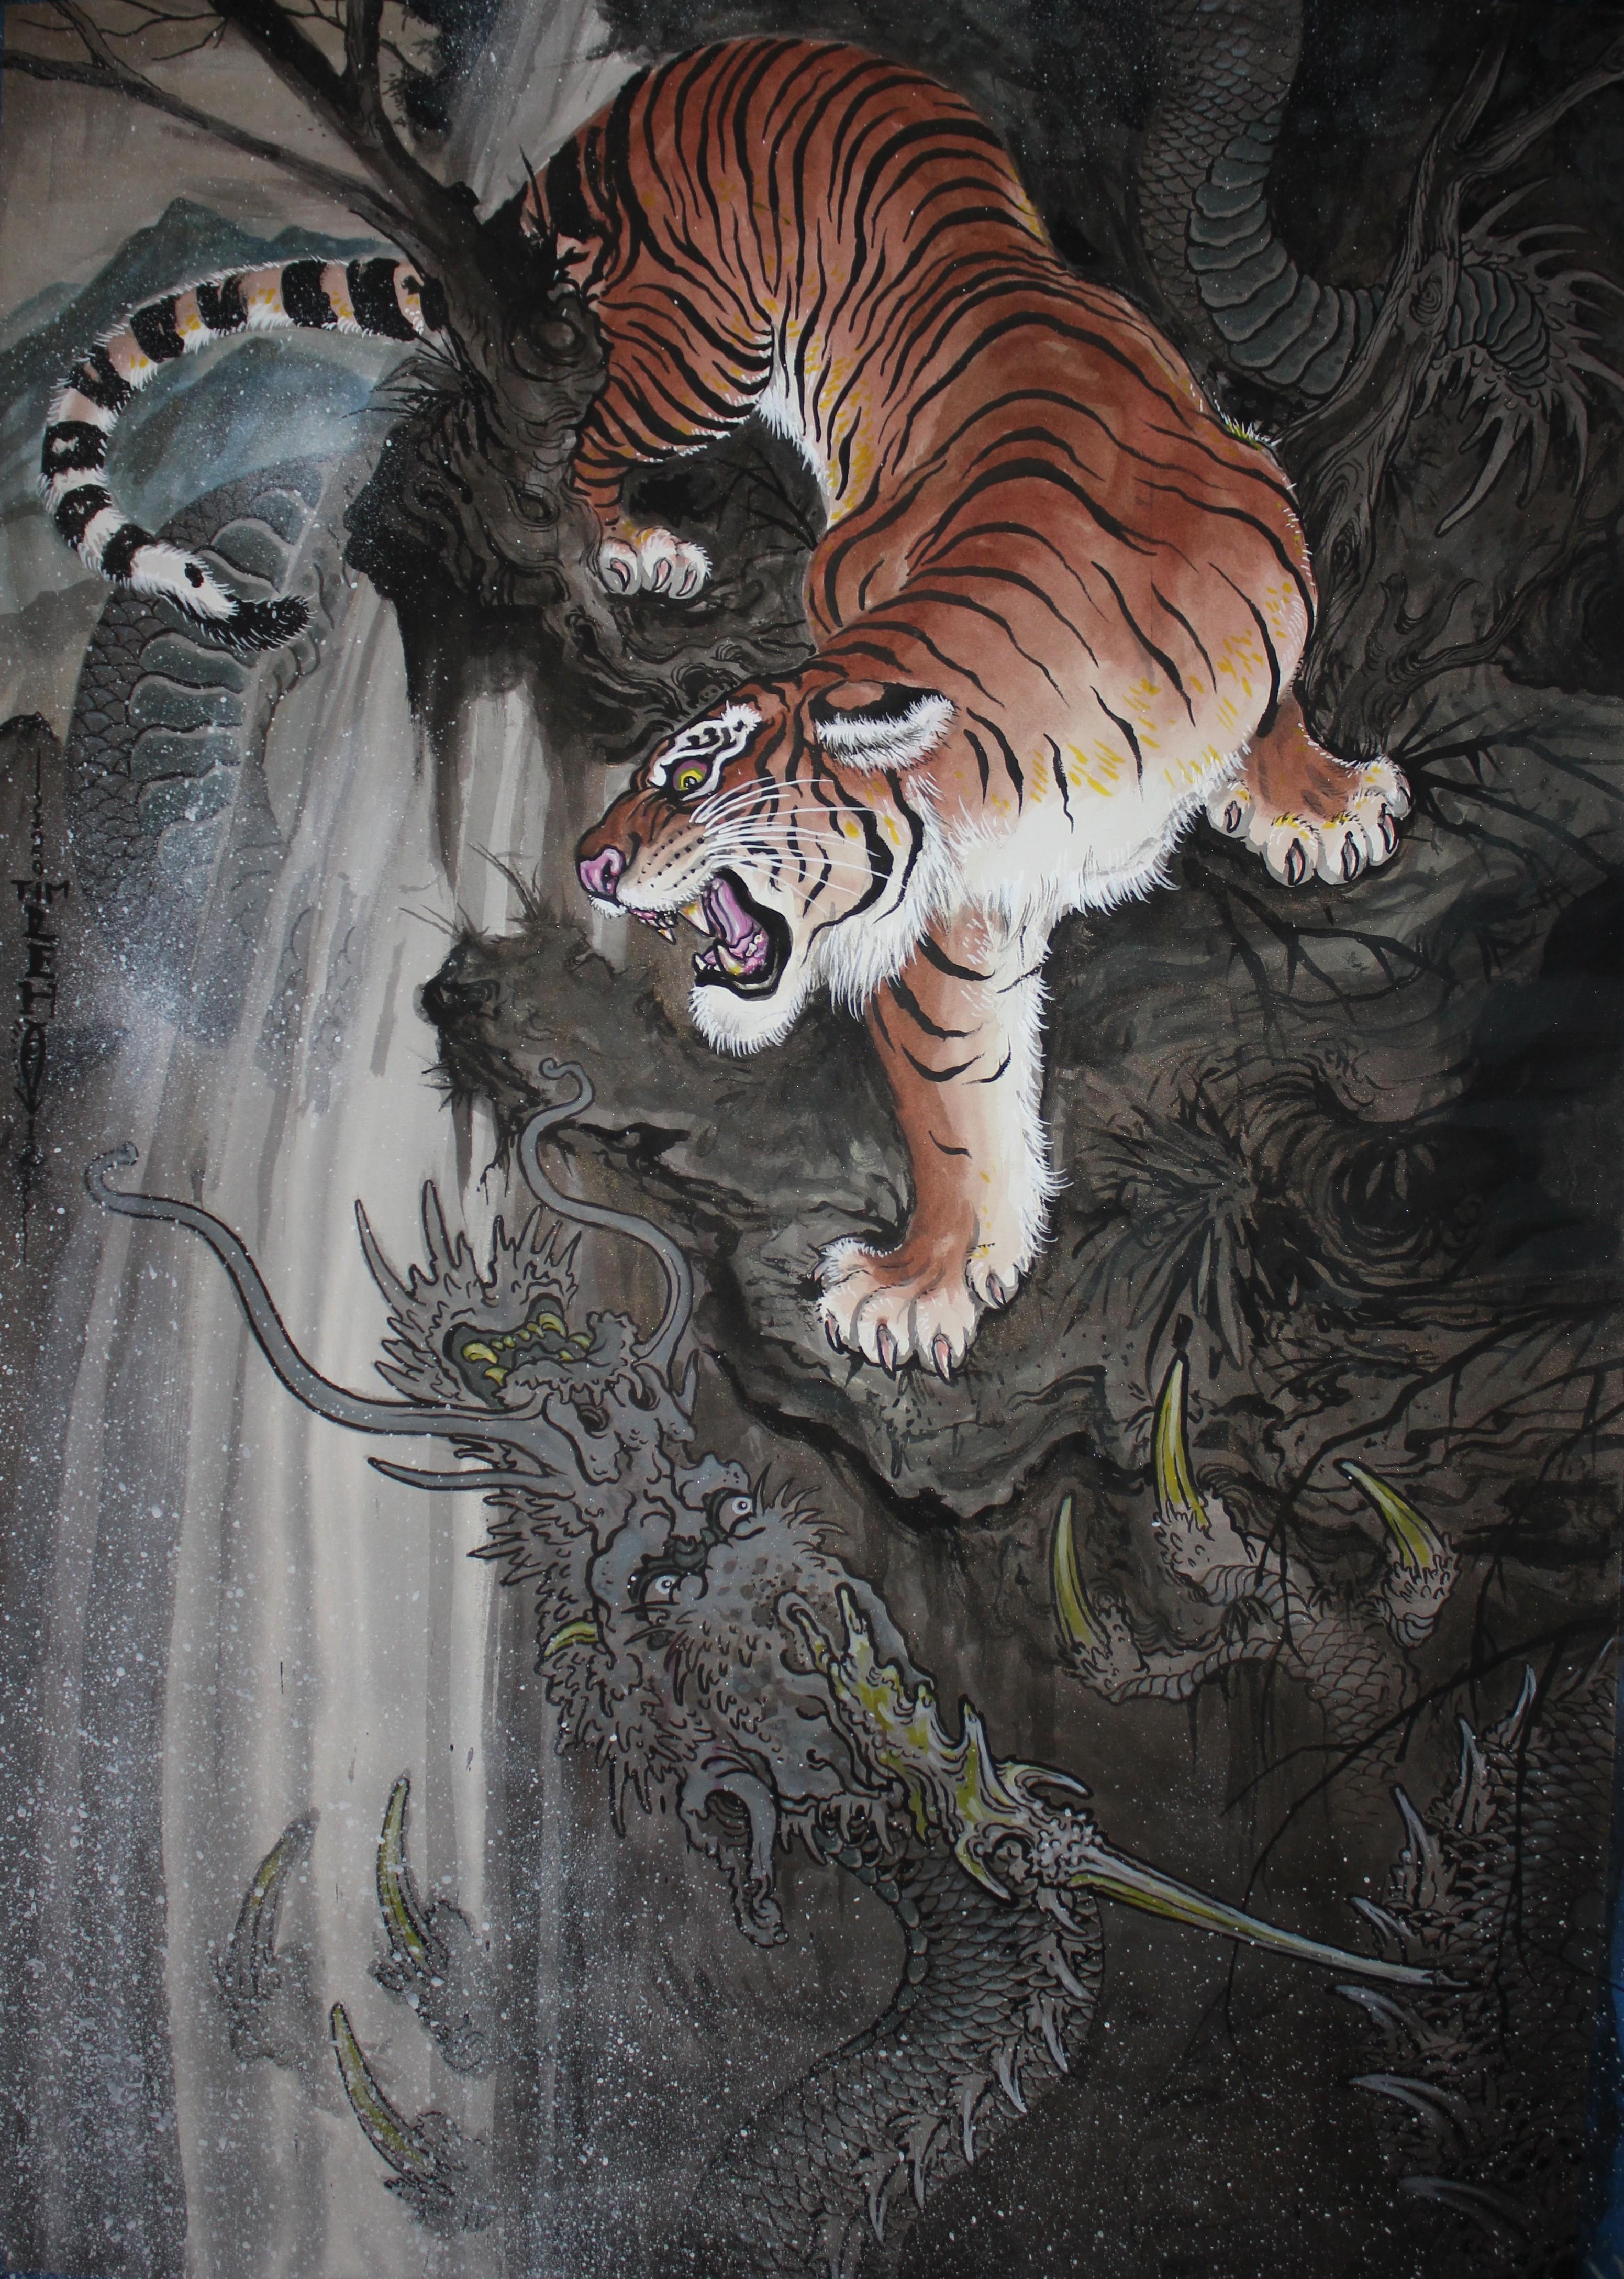 невероятно фотки дракон и тигр части мужчина передал